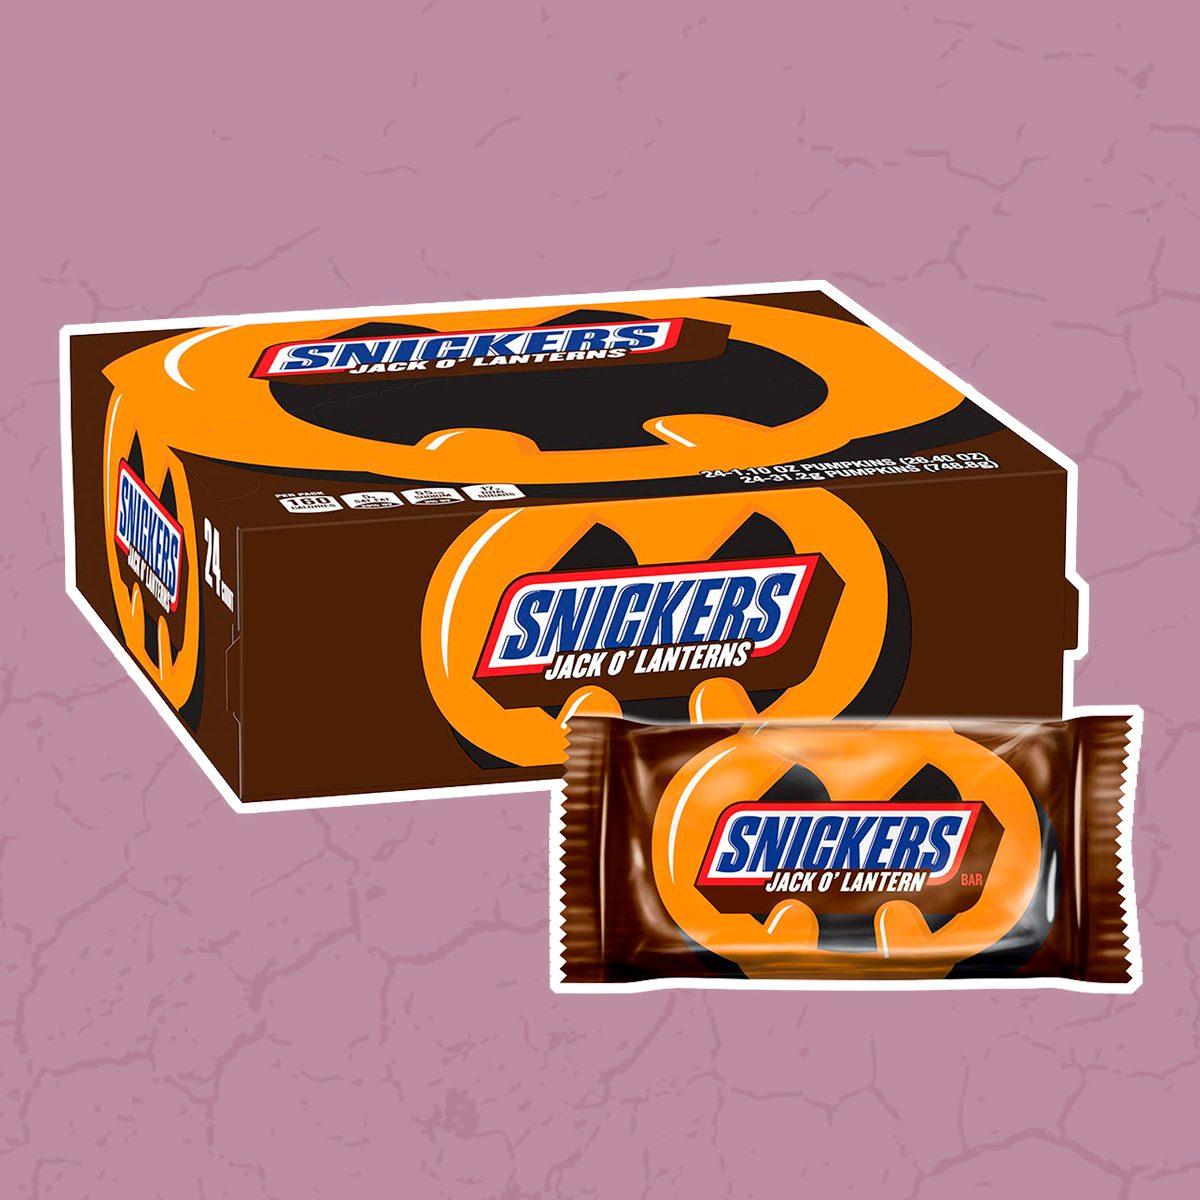 SNICKERS Halloween Pumpkin Singles Chocolate Candy